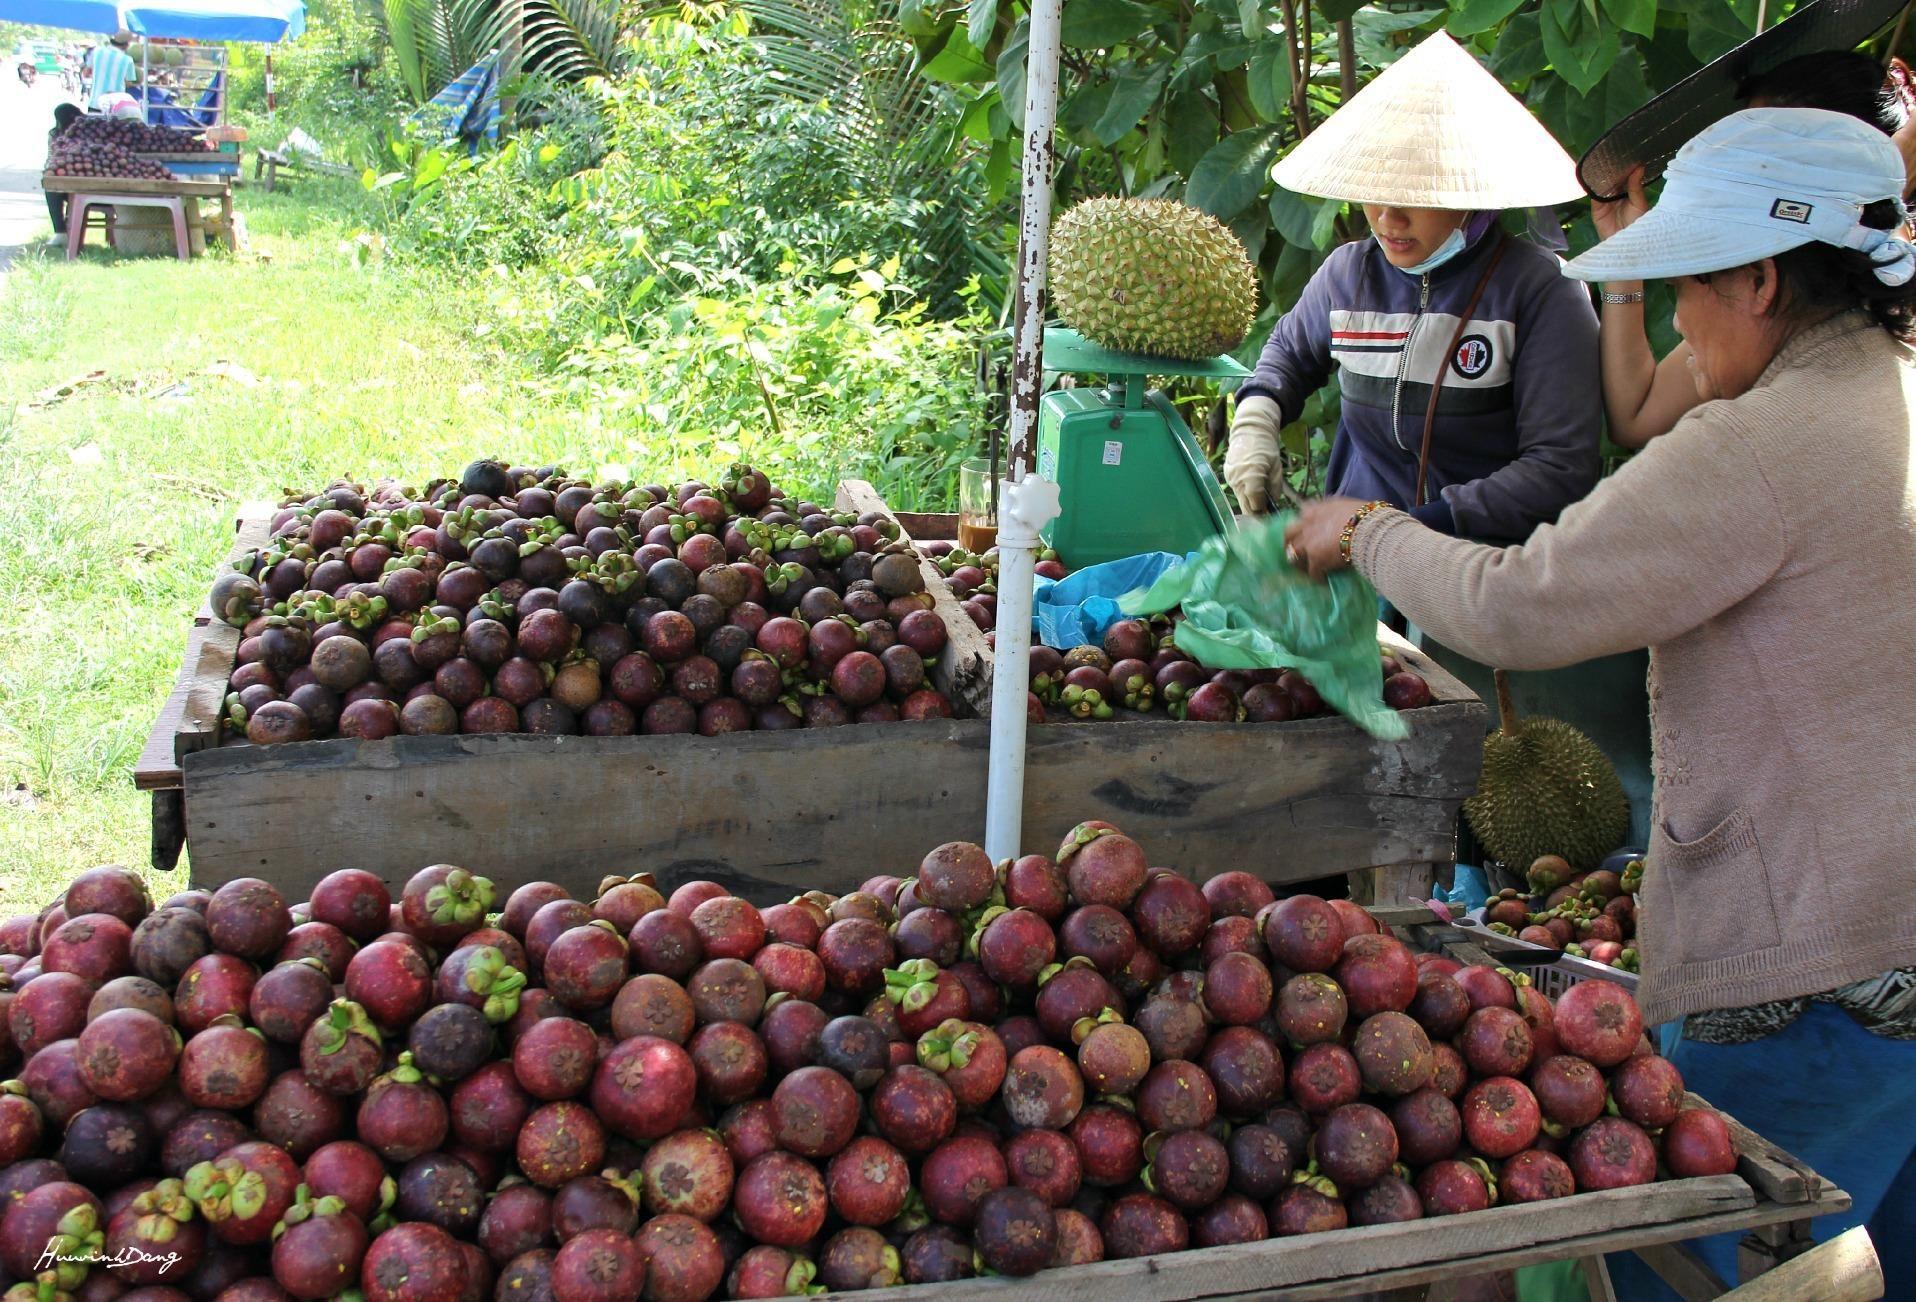 Fruits sale in Cho Lach district, Ben Tre province, Vietnam